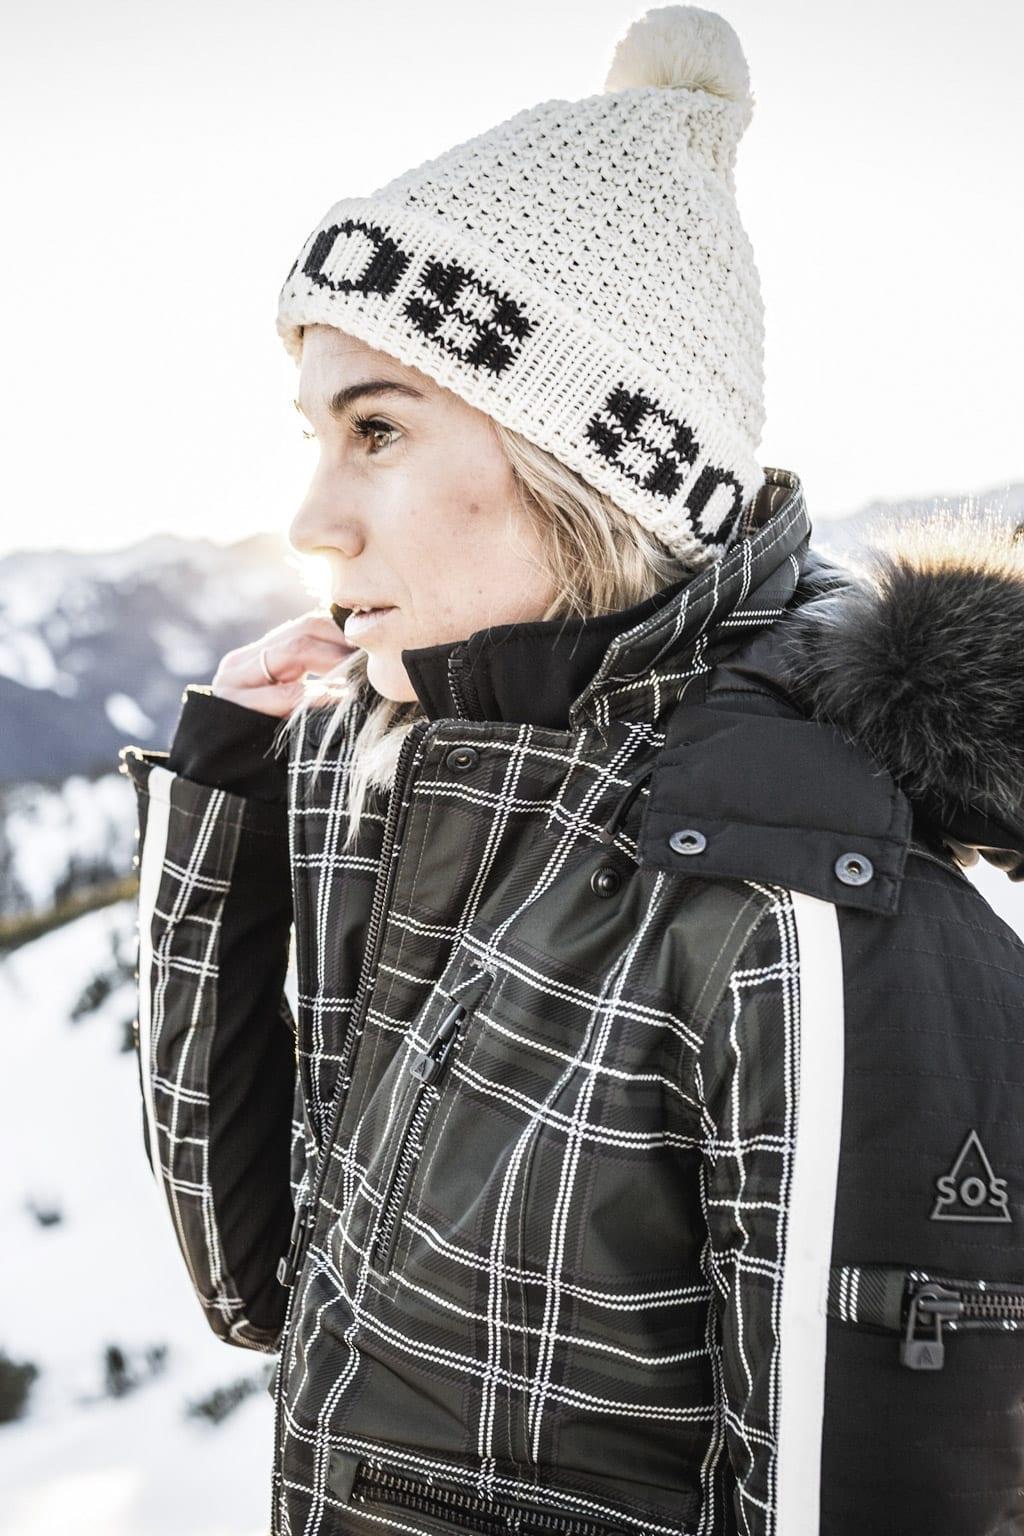 ck-constantlyk-com-sos-skiwear-sportswear-austria-alps-wagrain-4898-2